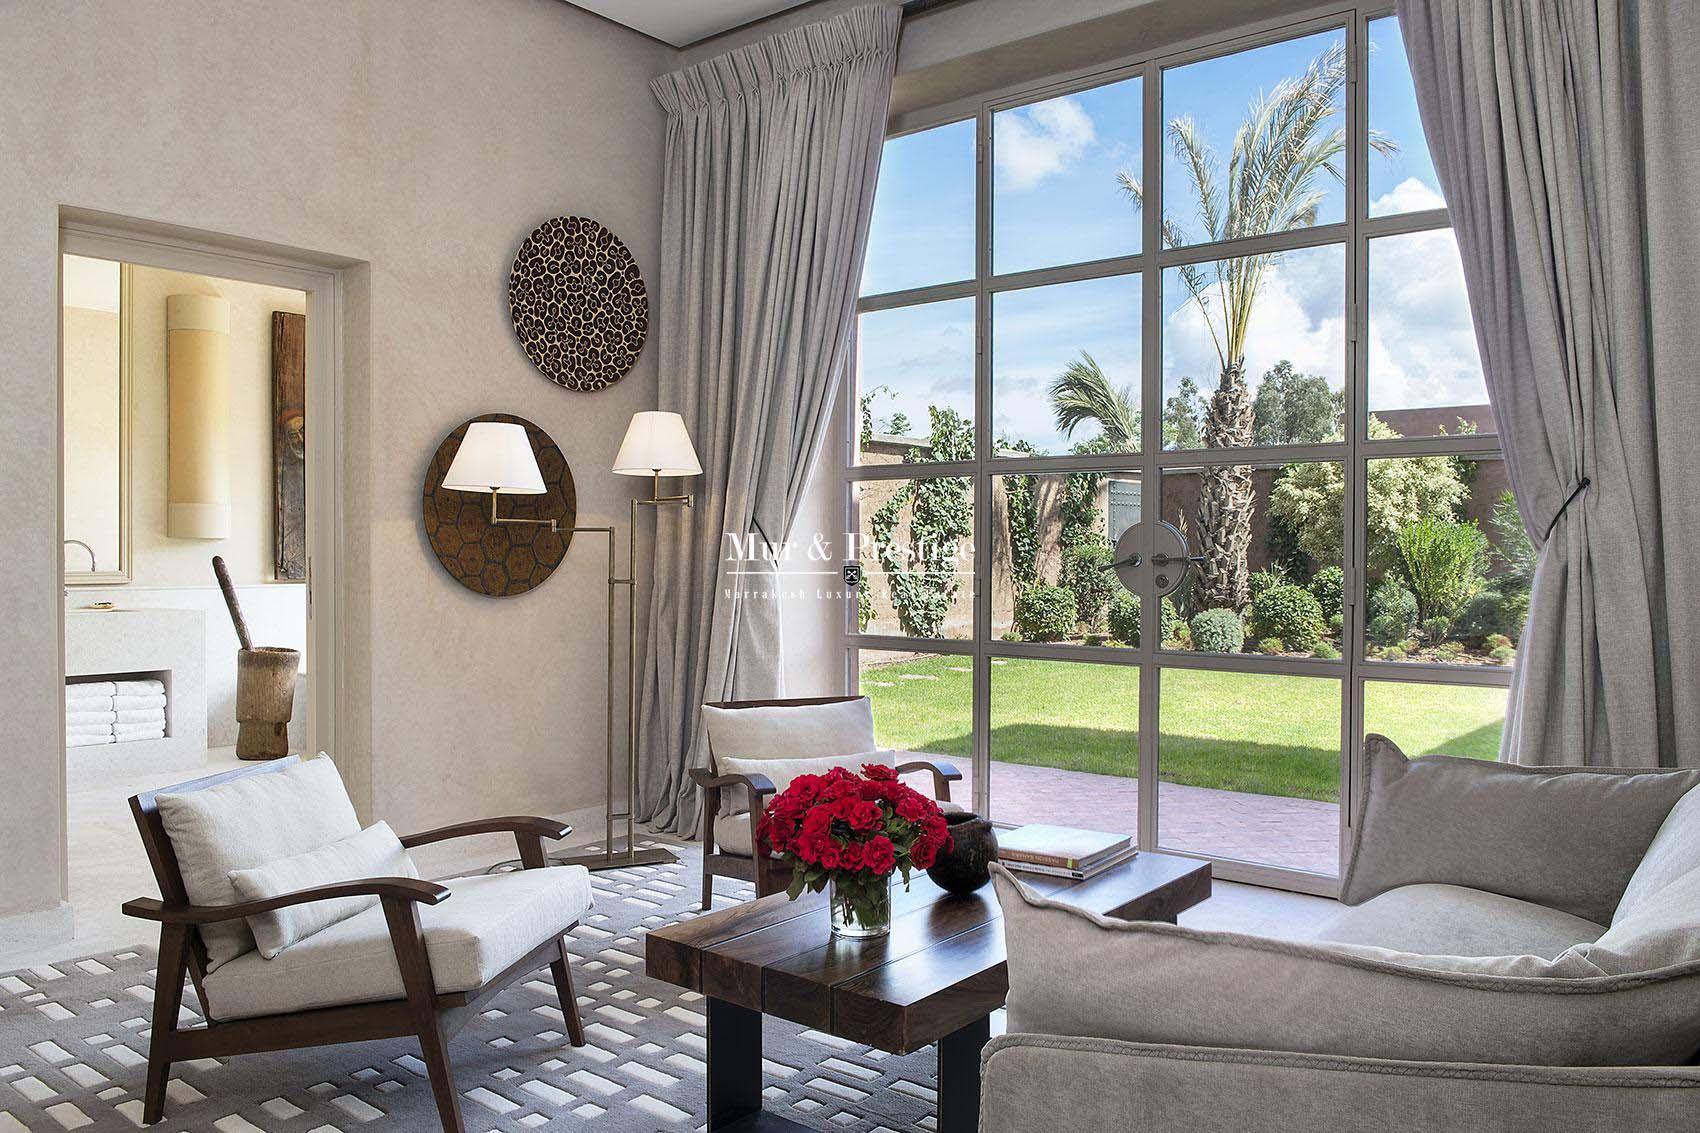 Demeure de prestige a vendre à Marrakech